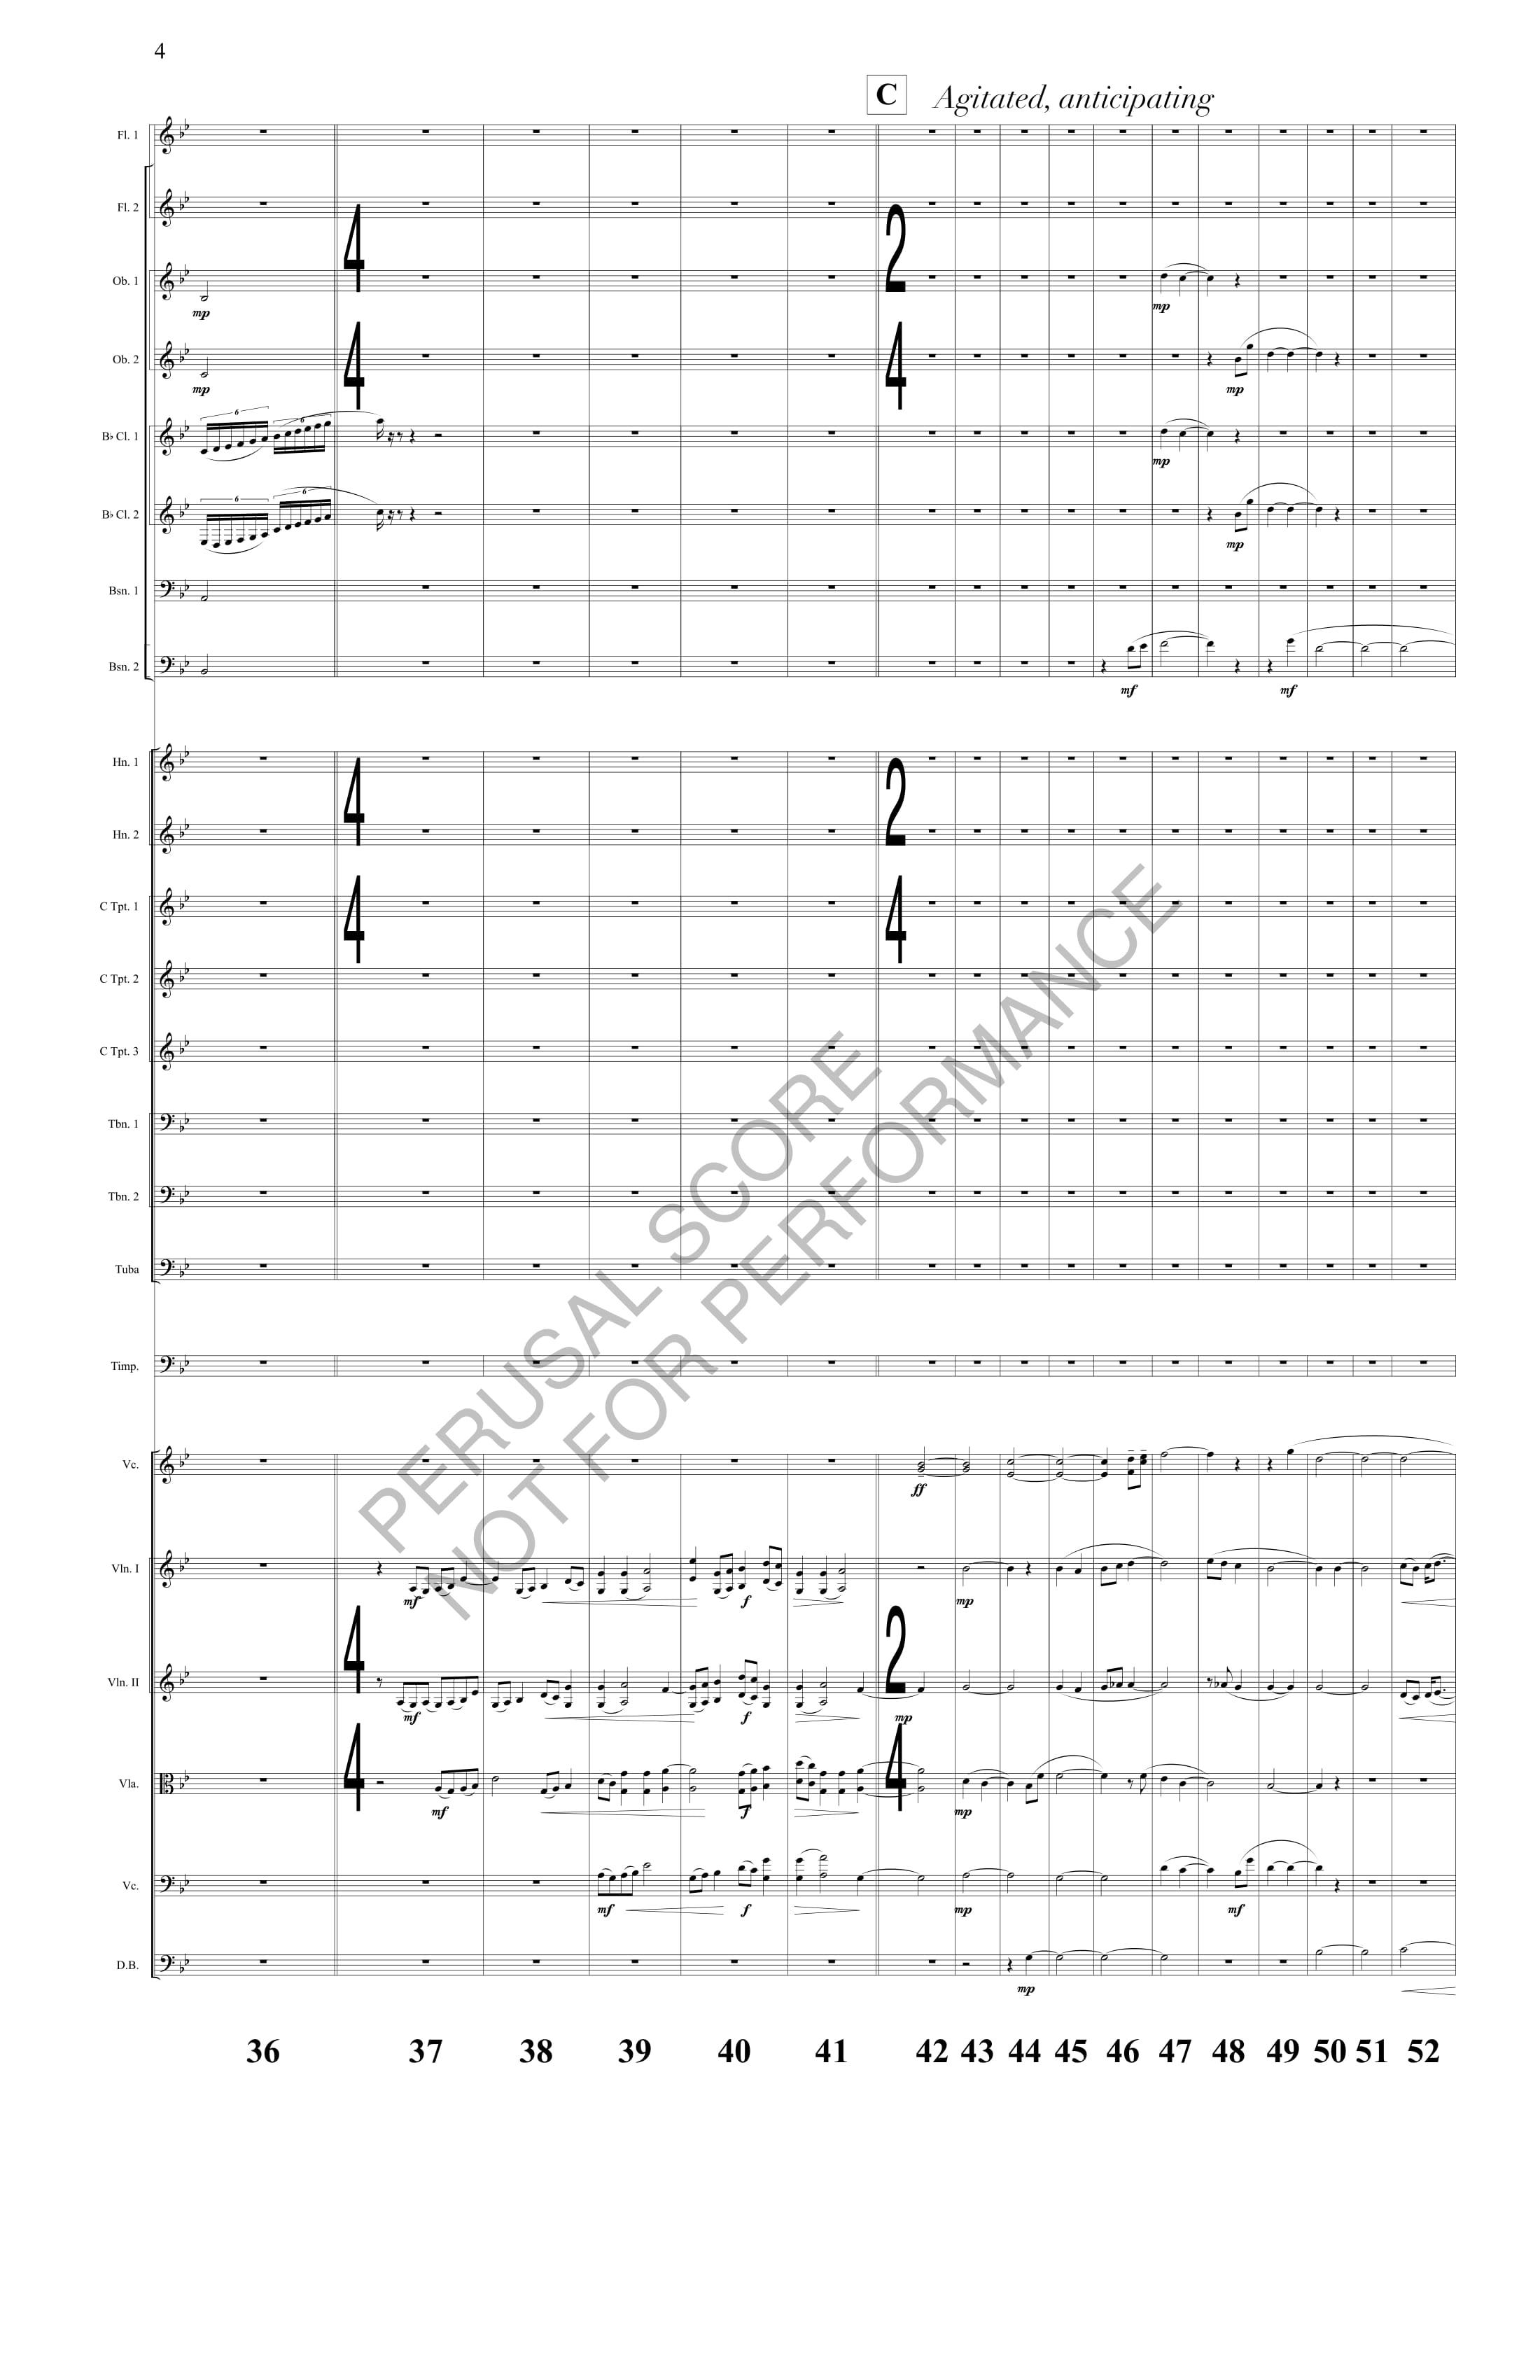 Boyd Tekton Score-watermark-10.jpg